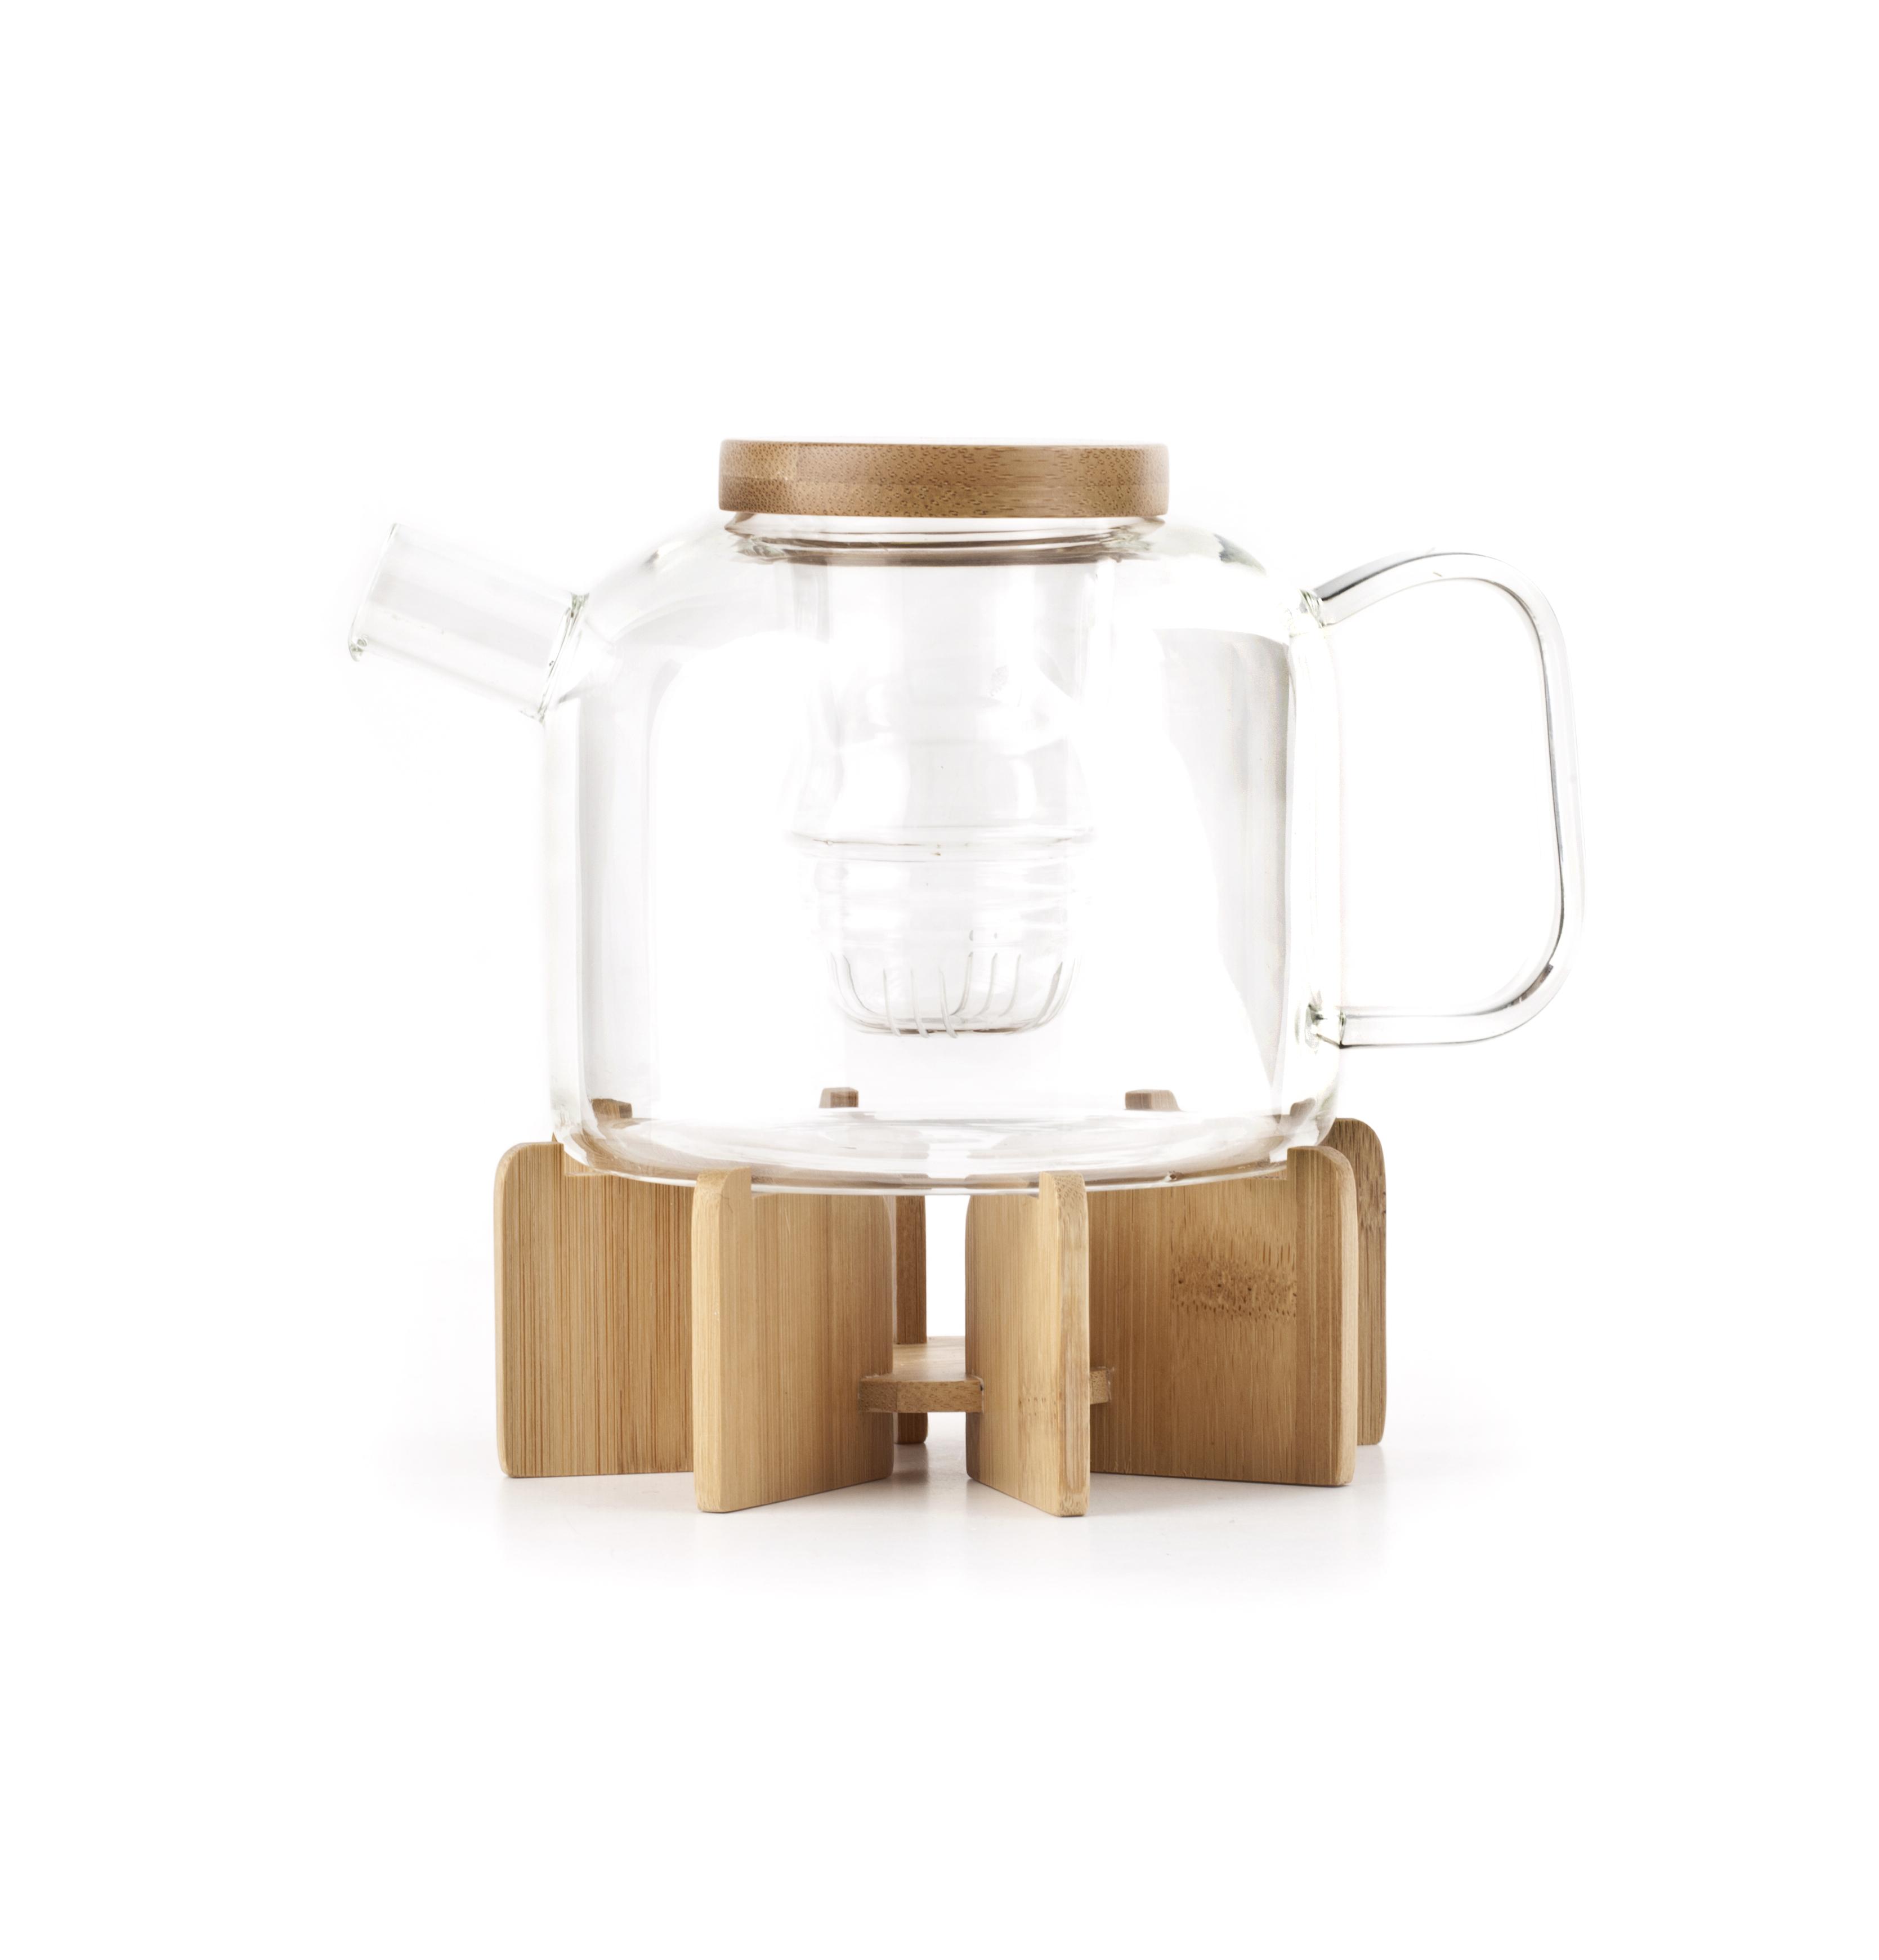 Year Calendar Kikkerland : Kikkerland design recalls teapots with stands due to fire hazard